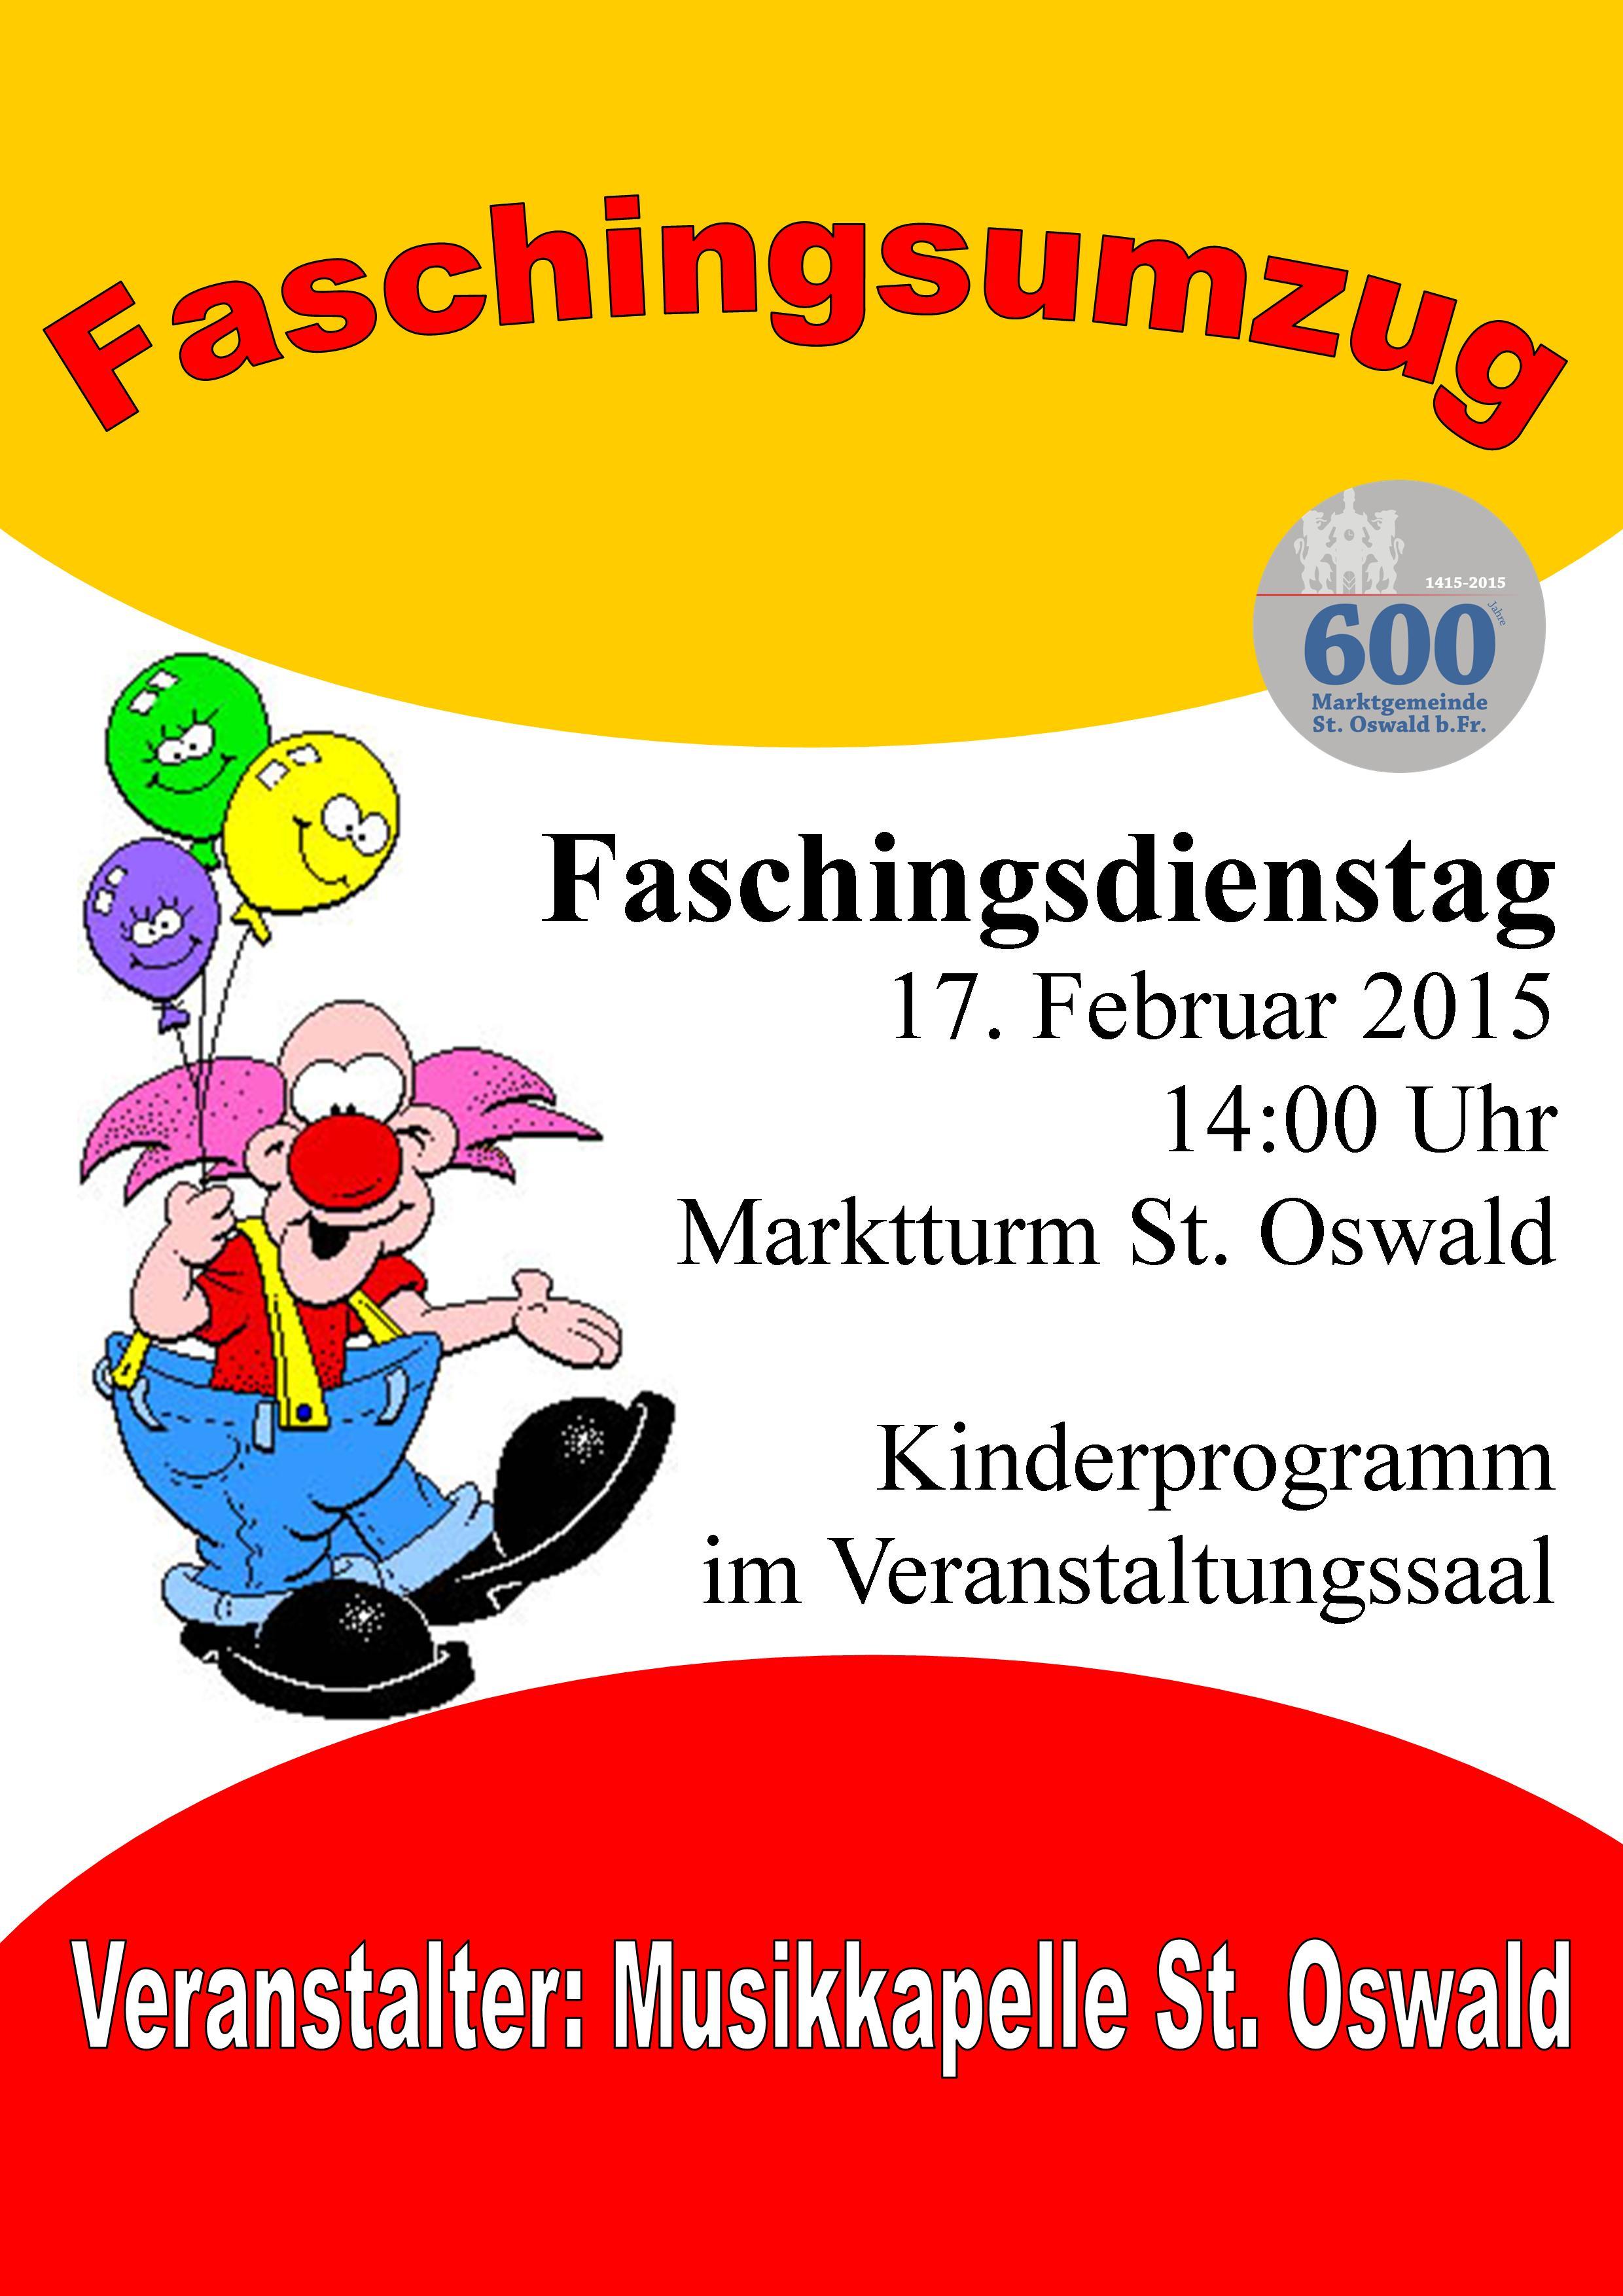 Kinderfasching 2015